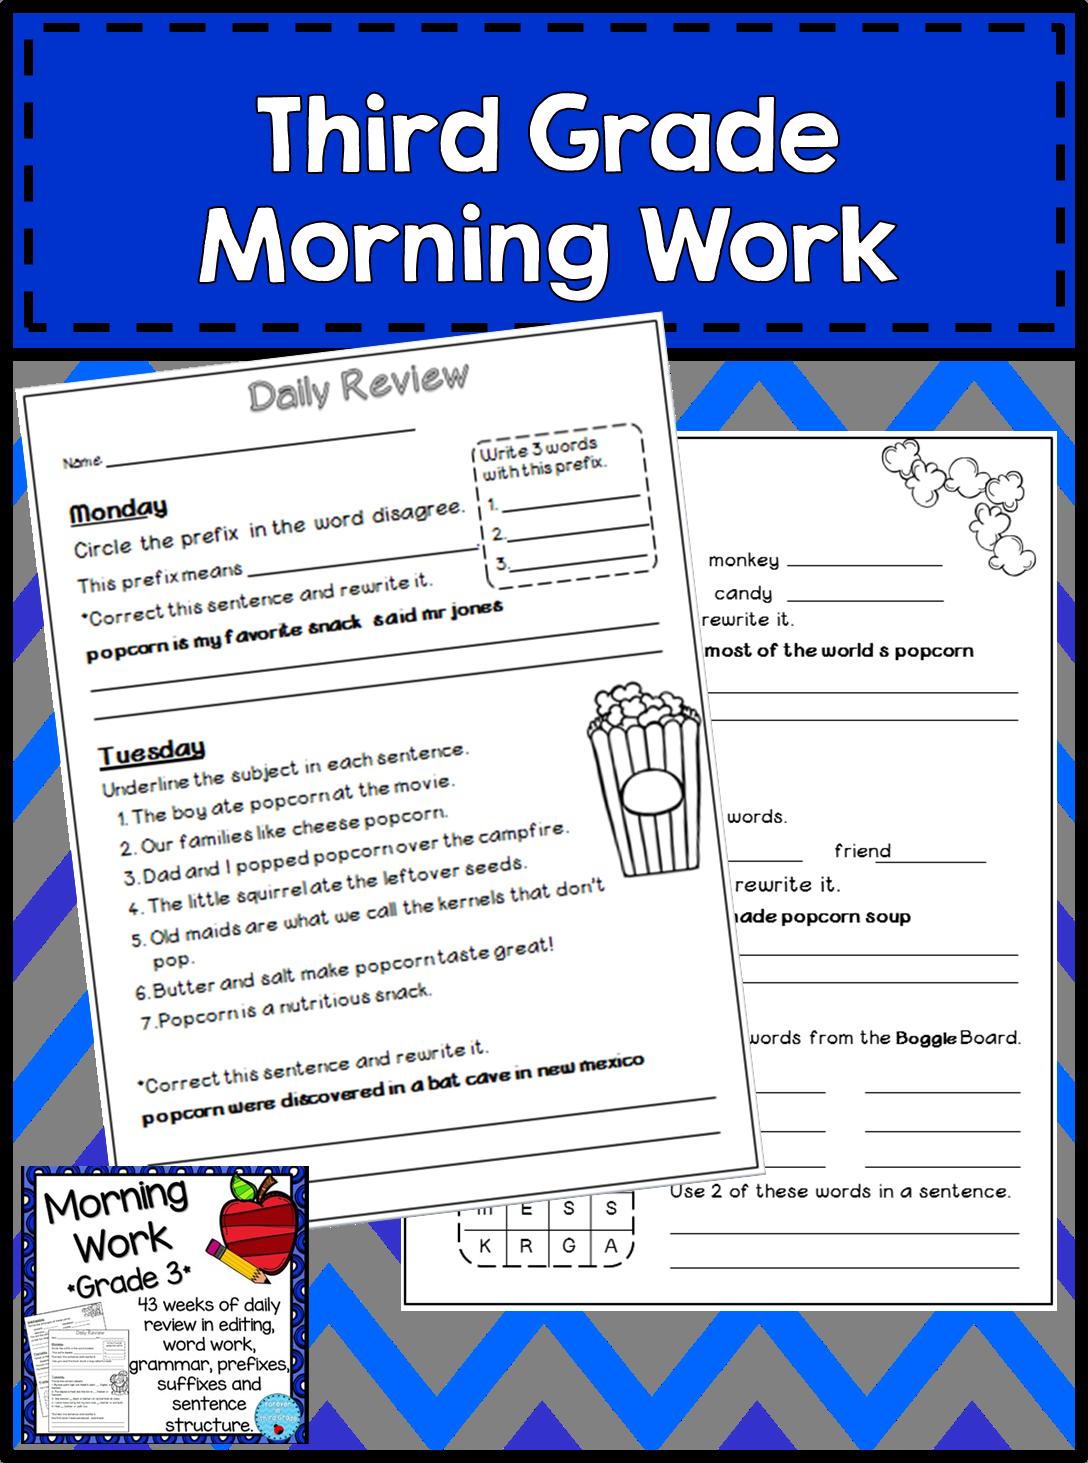 Morning Work - Third Grade   Terrific Third Grade   Third